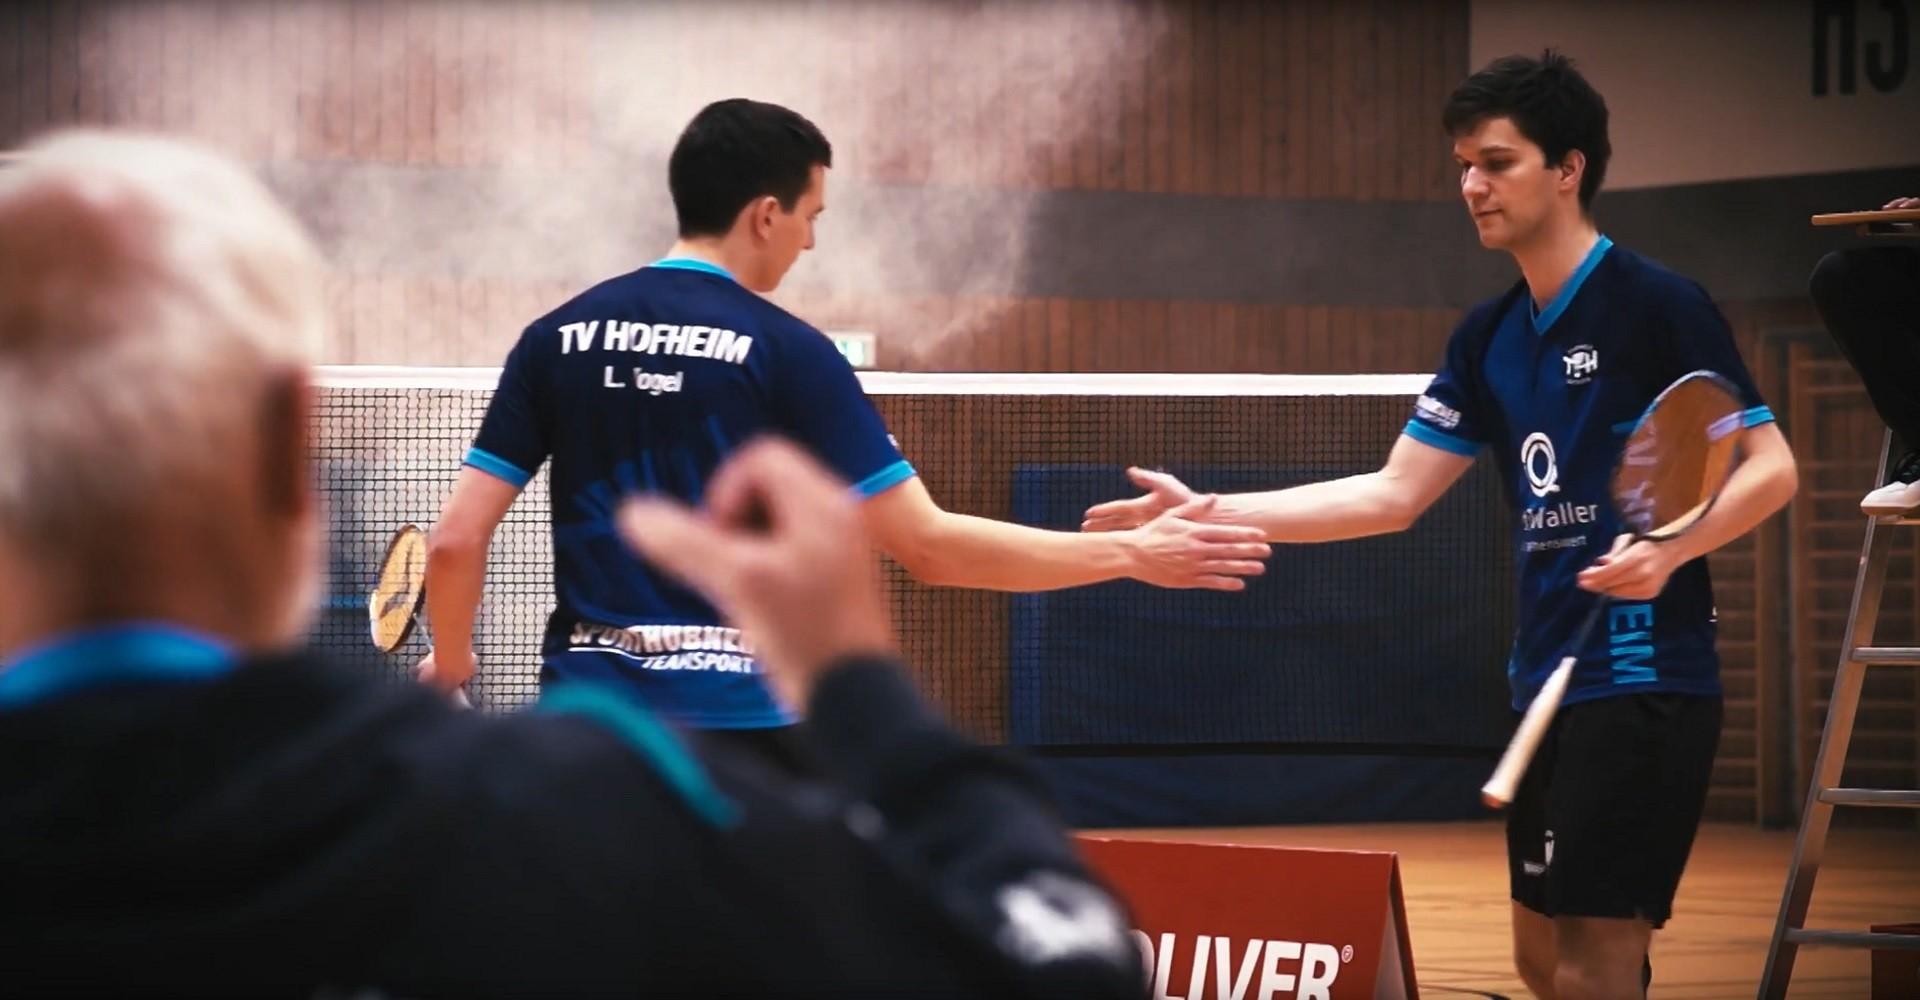 tvhofheim_badminton